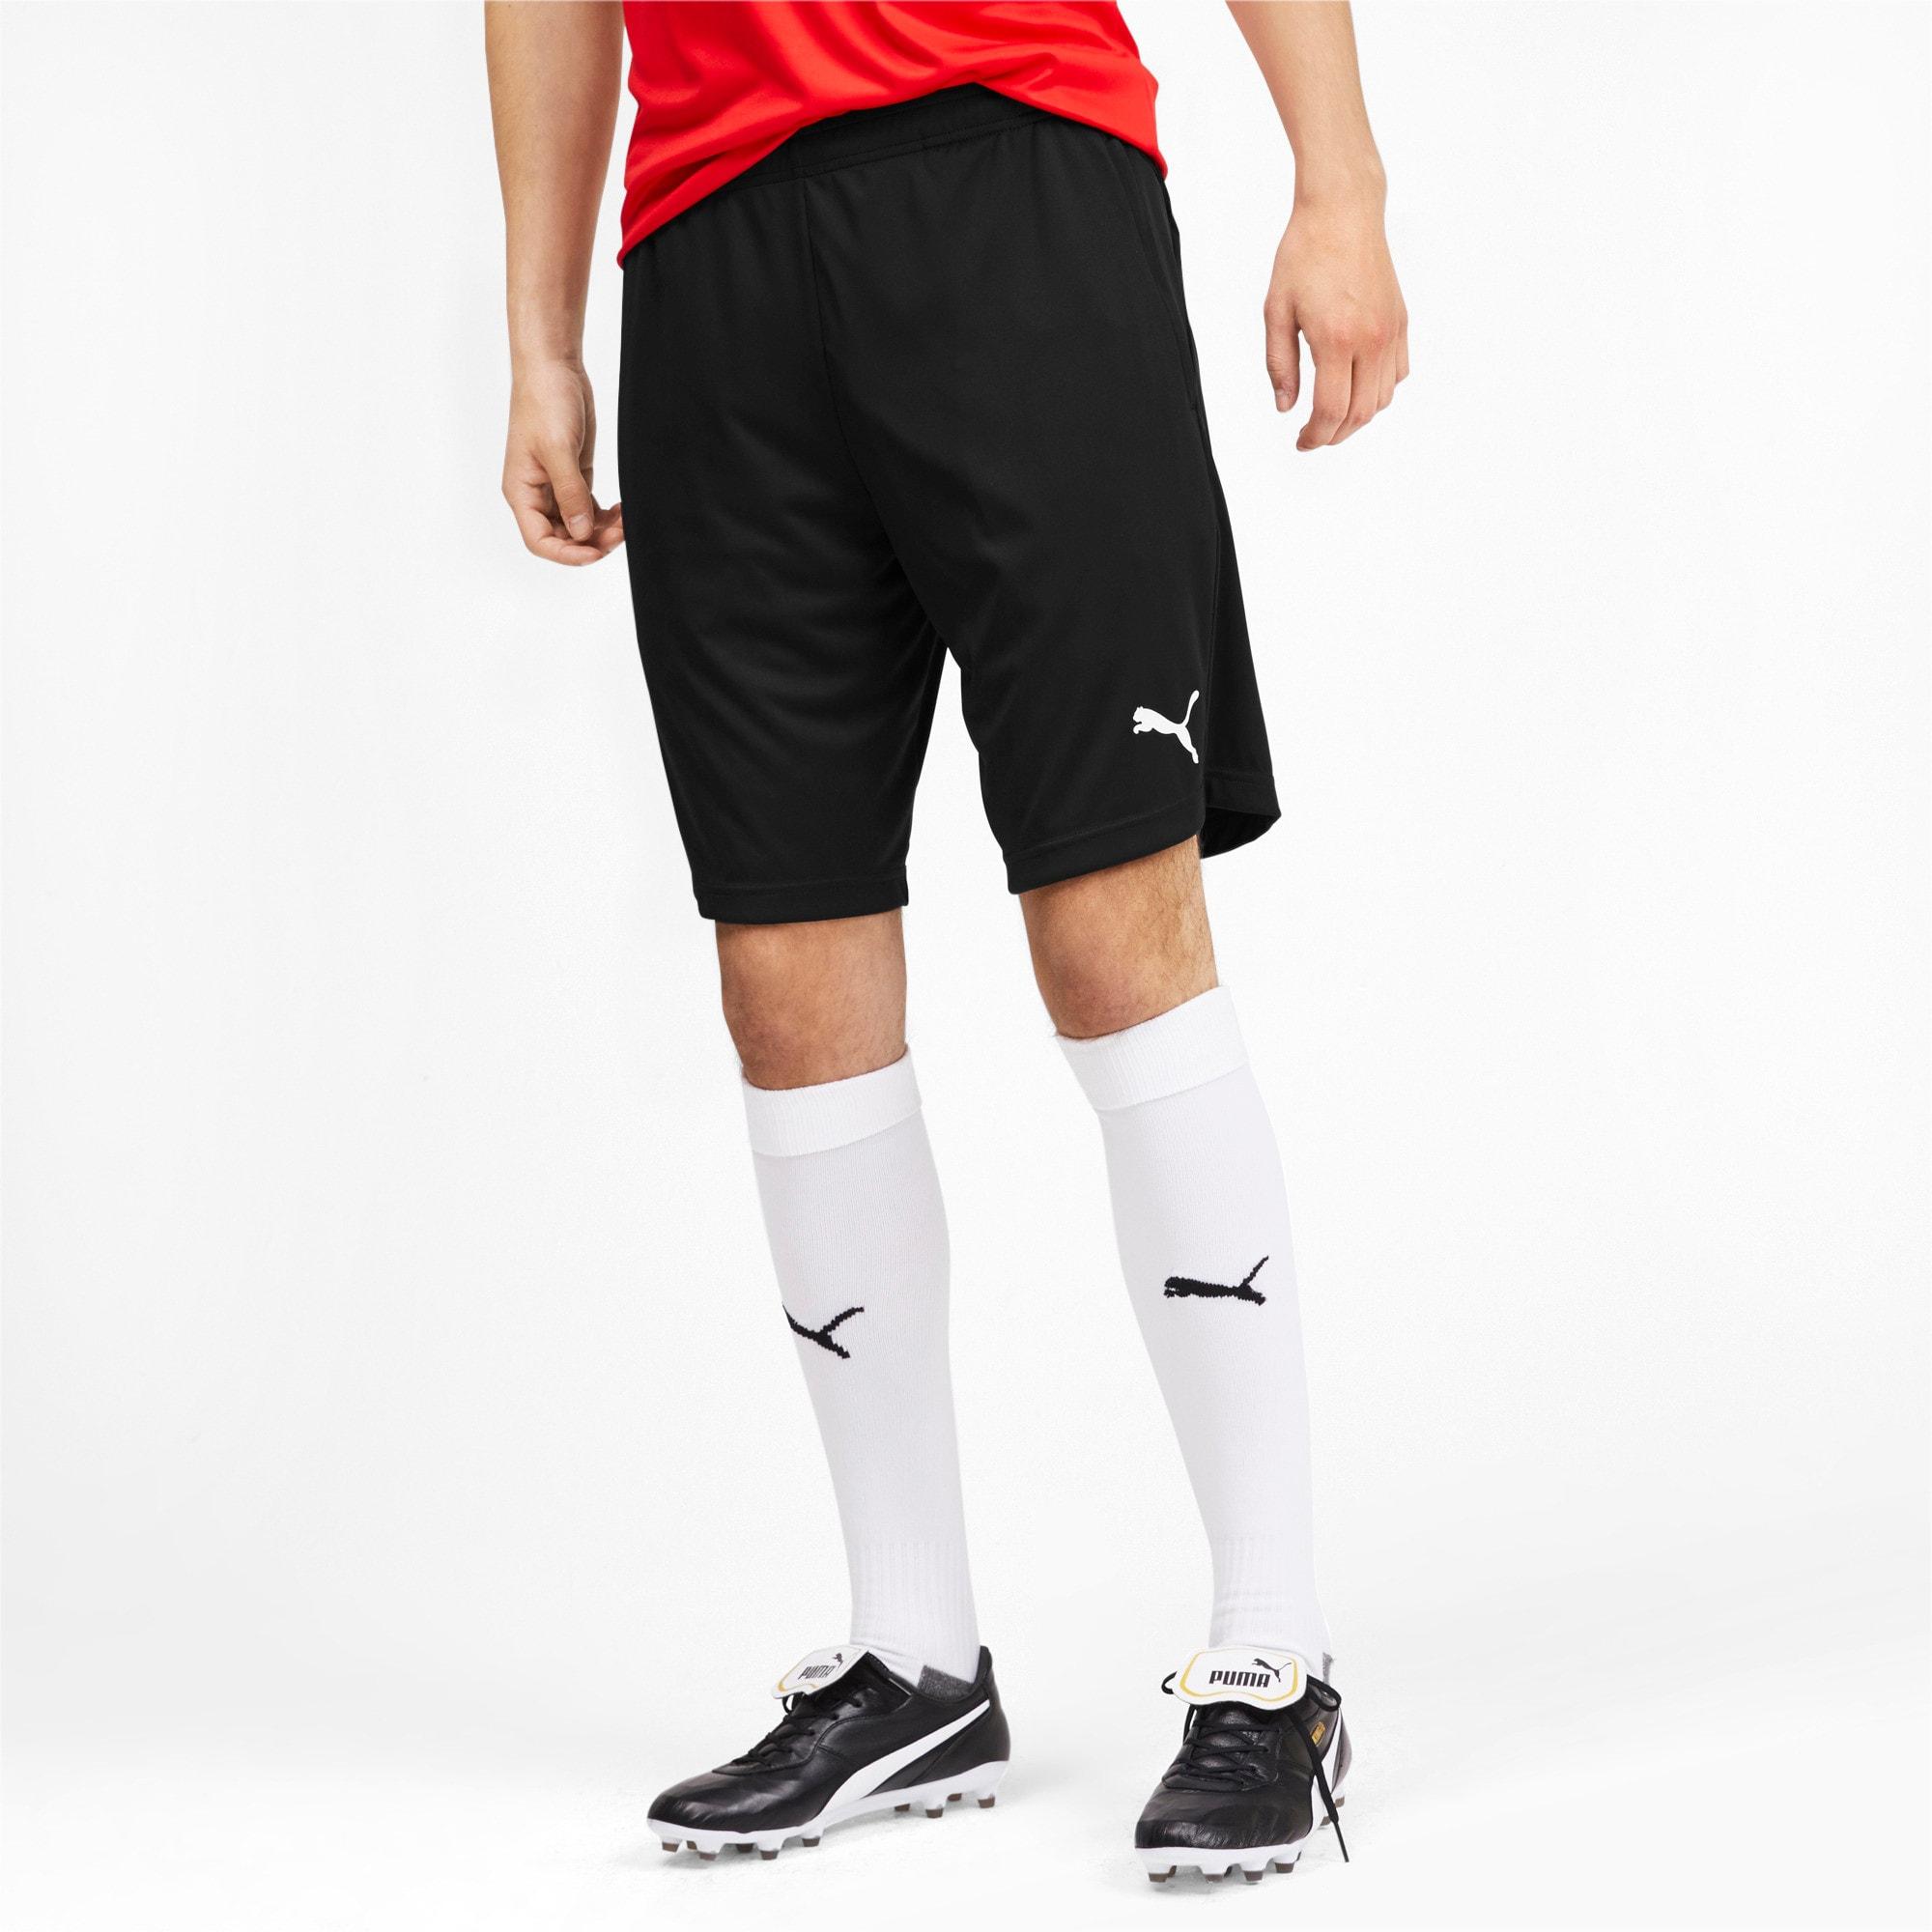 Thumbnail 1 of AC Milan Men's Training Shorts, Puma Black, medium